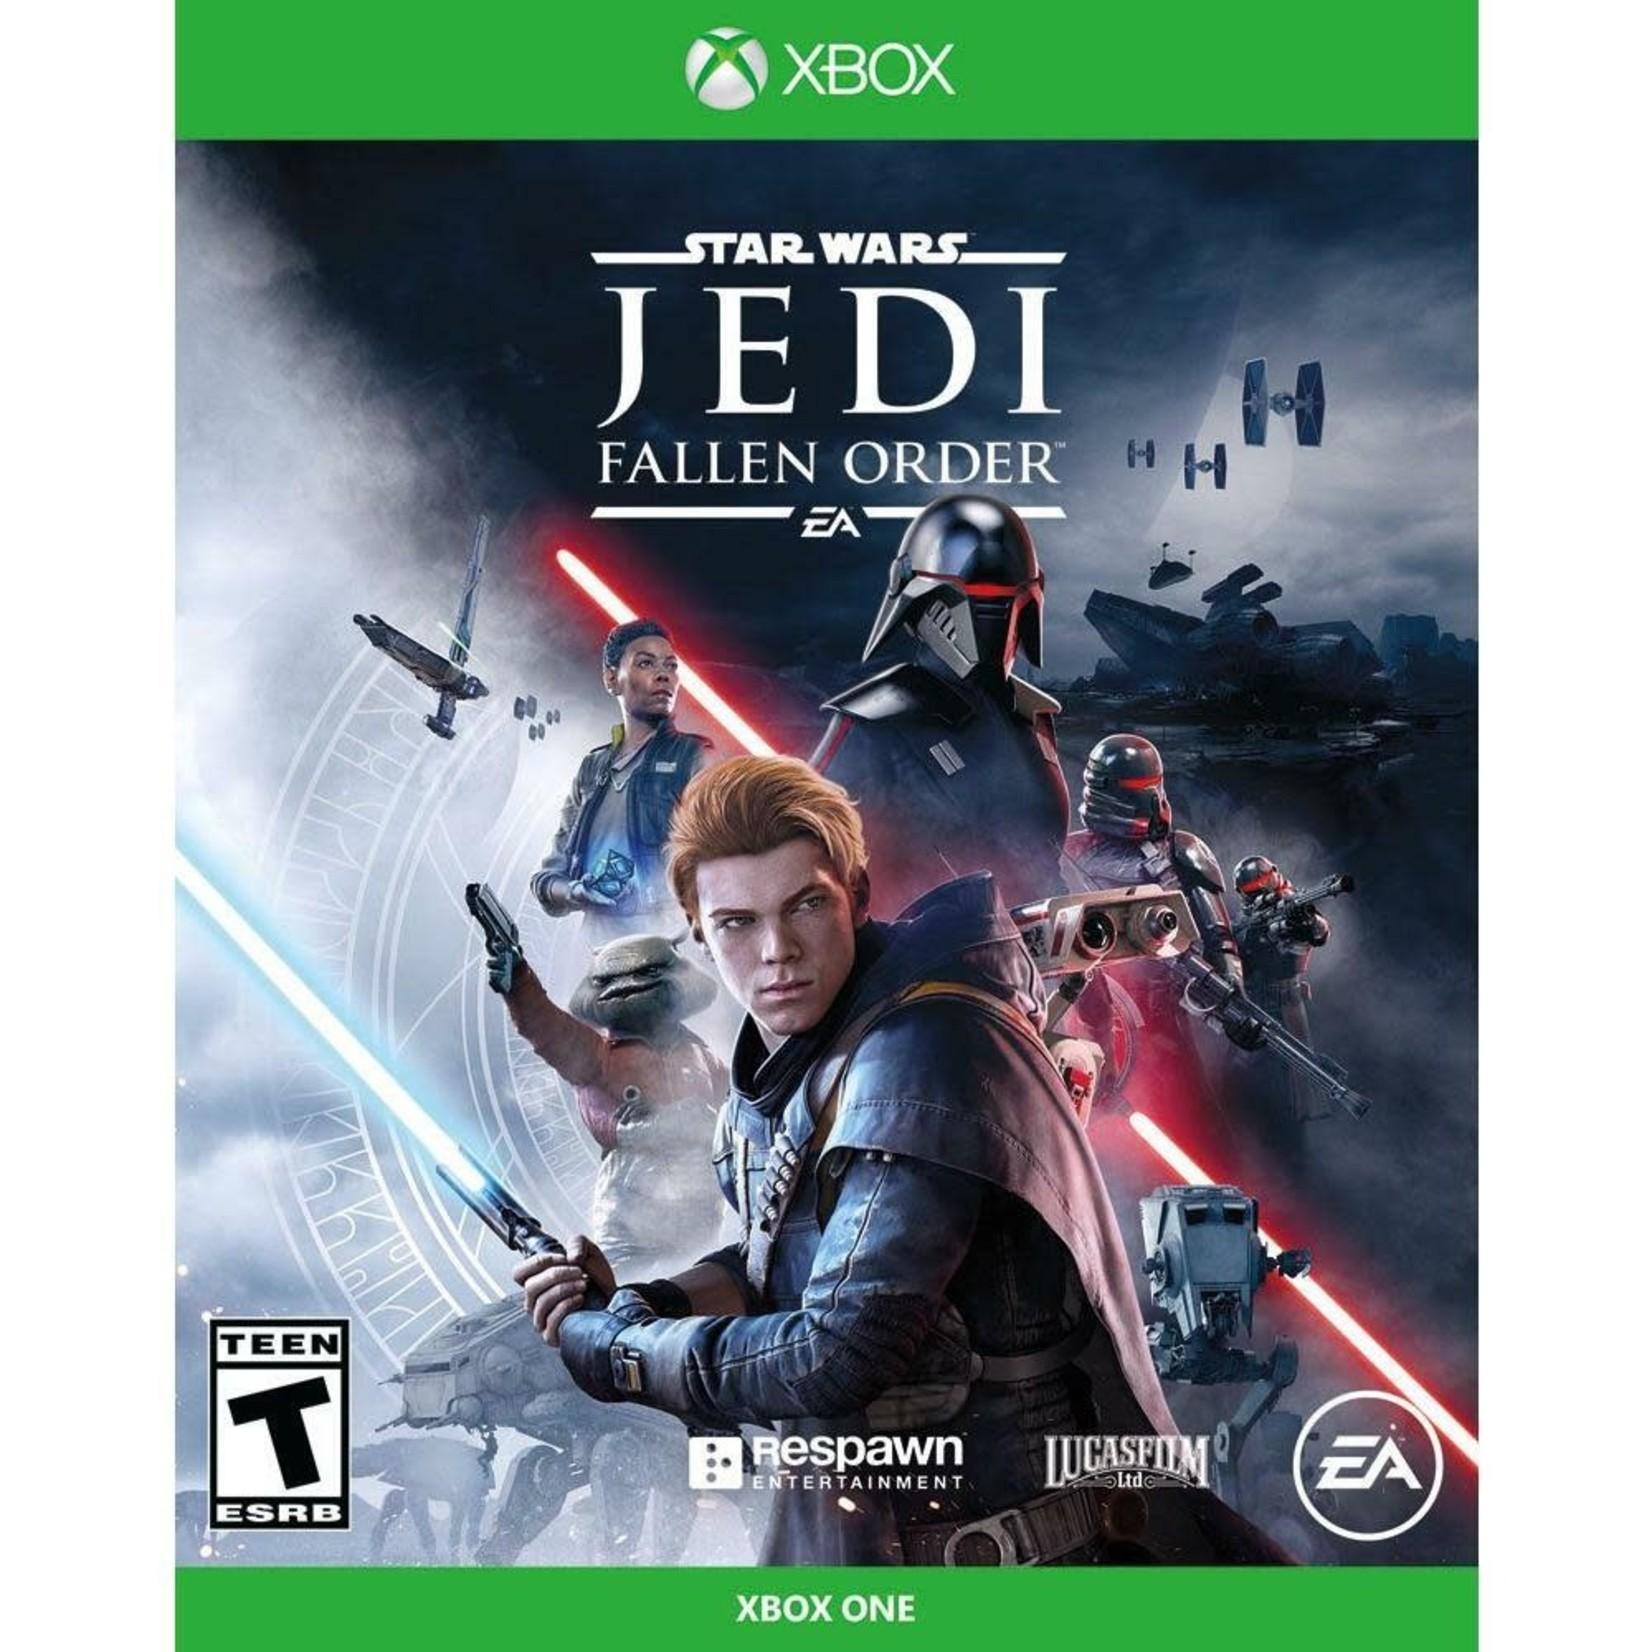 XB1-Star Wars Jedi: Fallen Order